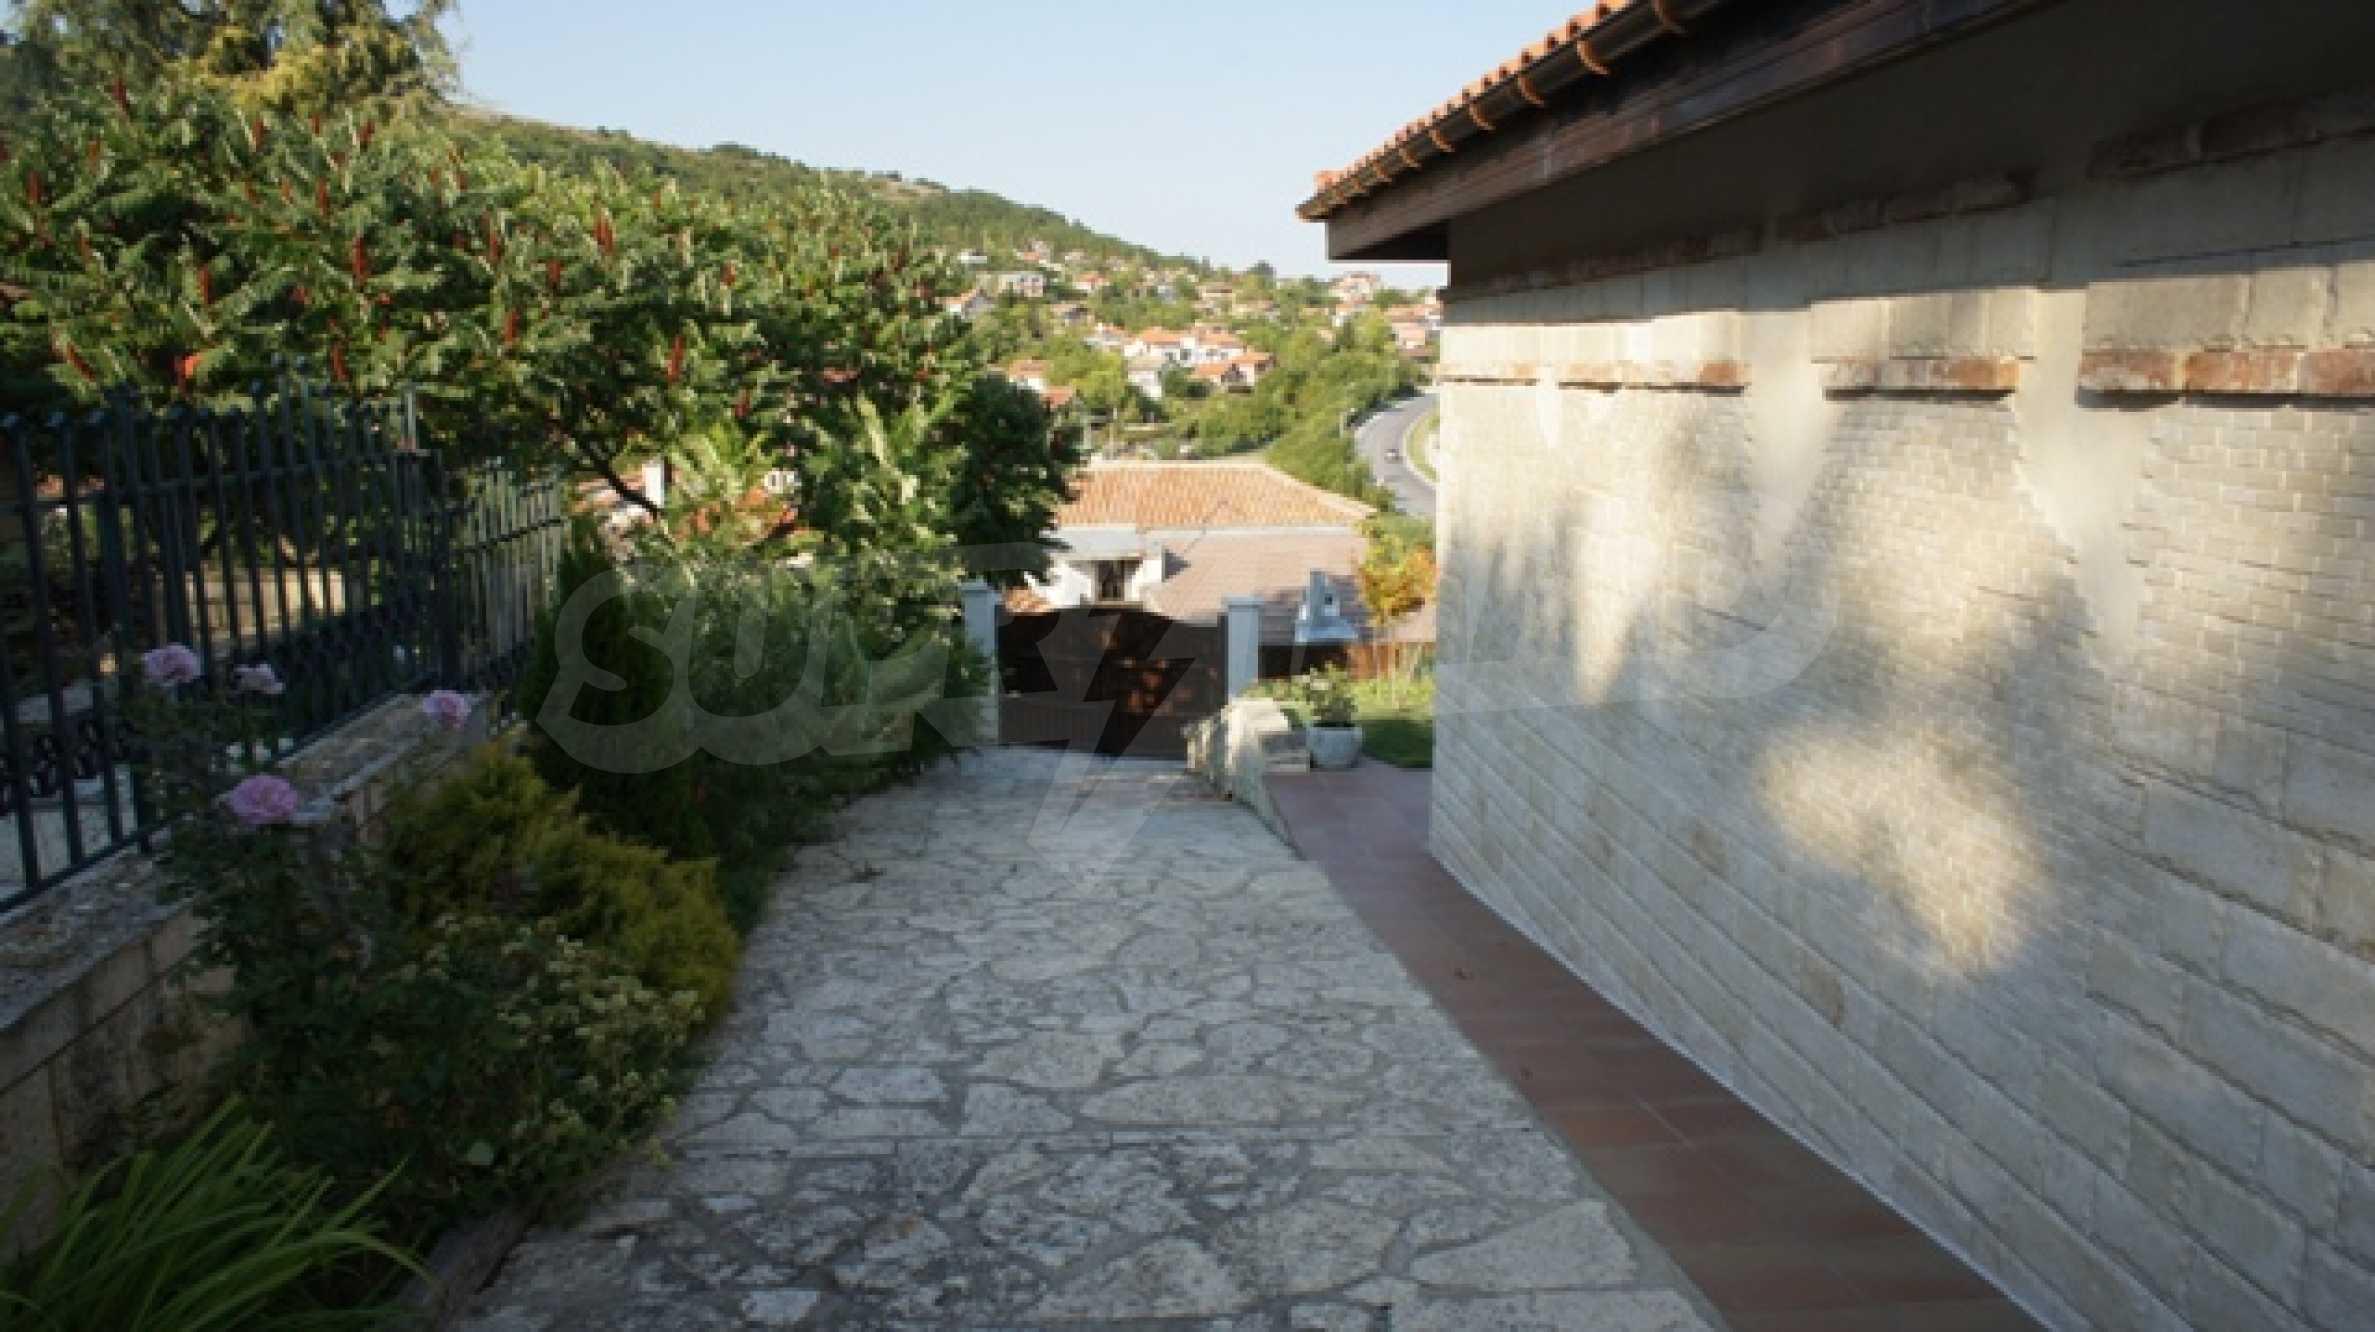 The Mediterranean style - a sense of luxury 12